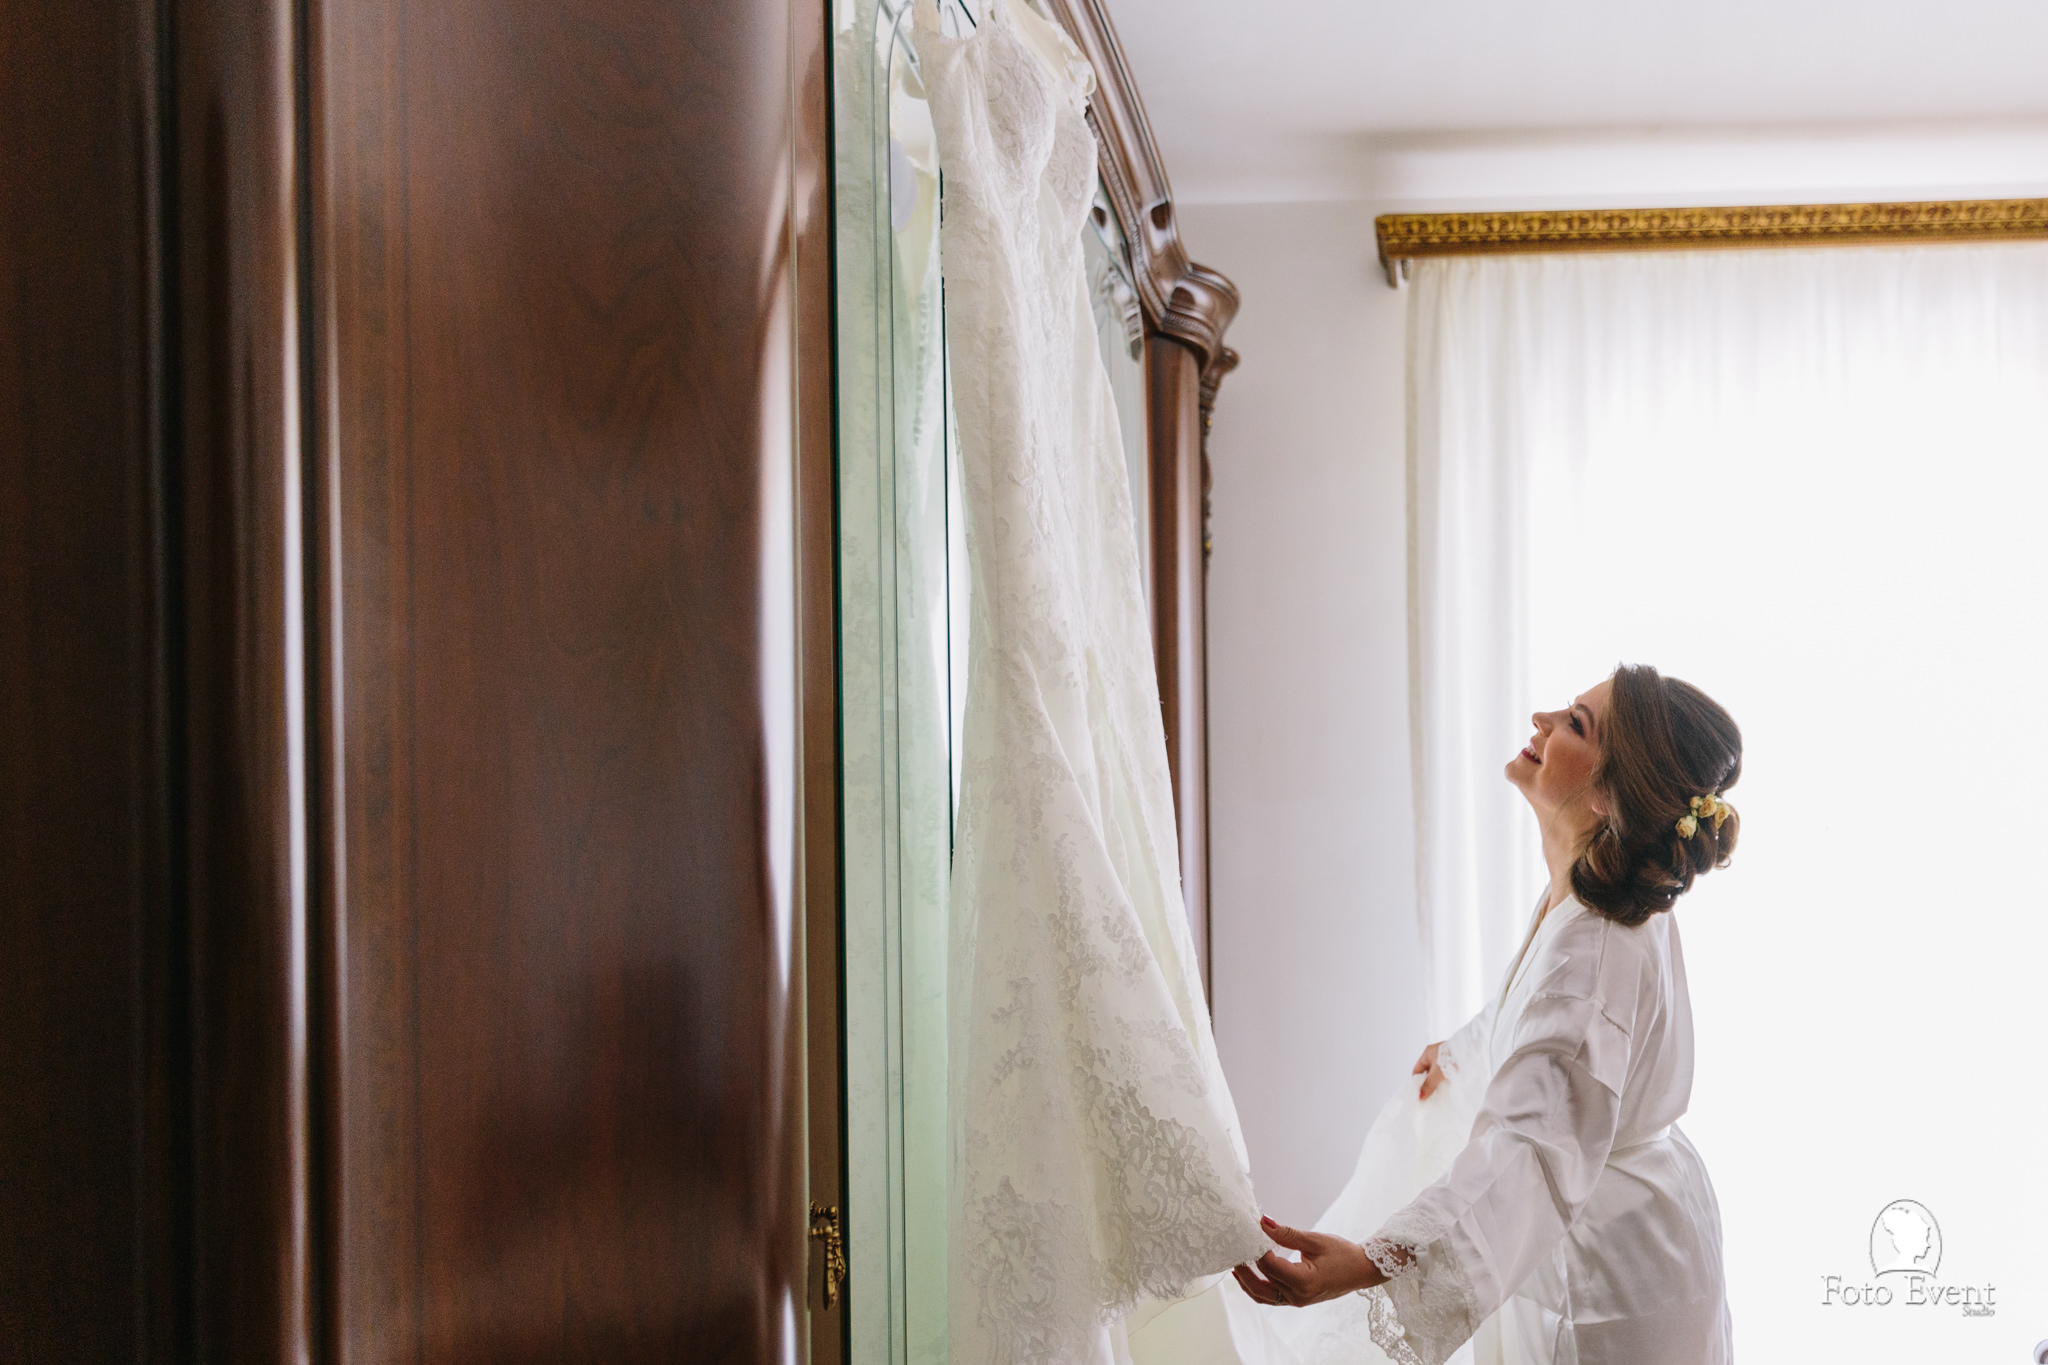 008-2019-06-12-Matrimonio-Rosa-e-Angelo-Ripellino-5DE-421